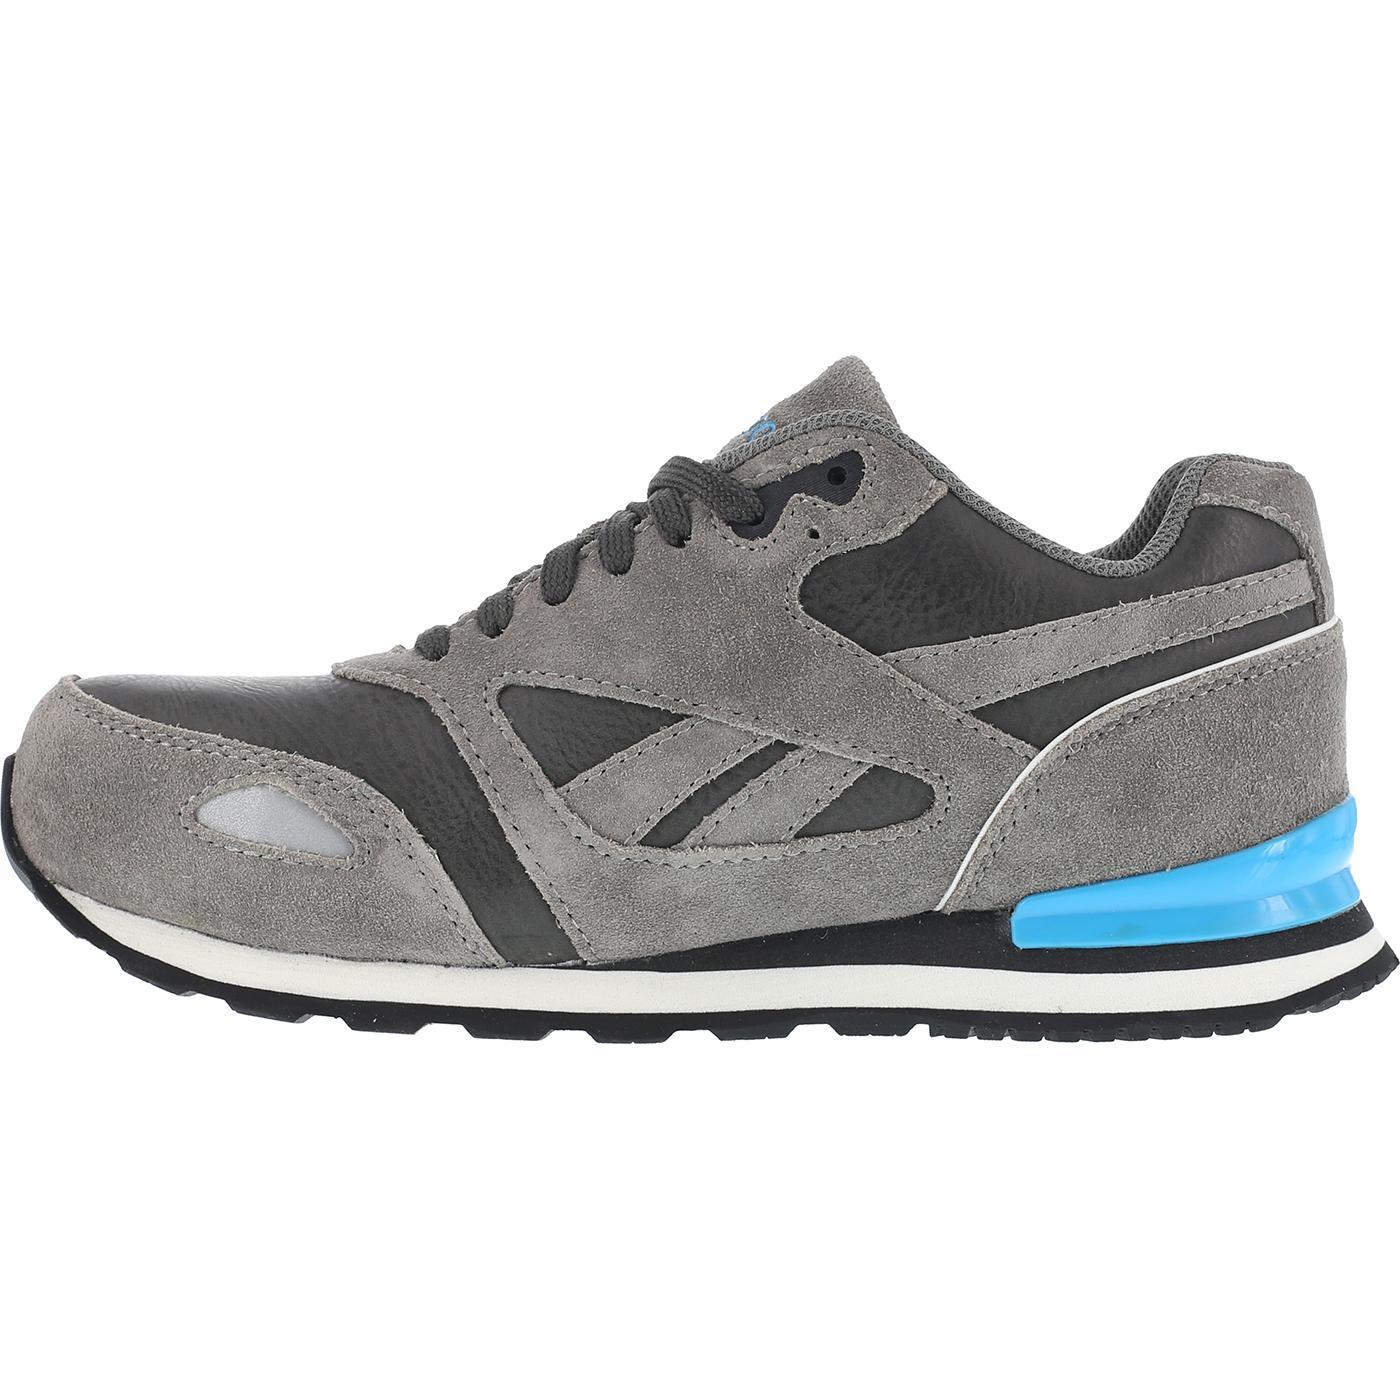 6743b68fad3f1a ... ShoeReebok Prelaris Women s Composite Toe Static-Dissipative Slip-Resistant  Work Athletic Shoe